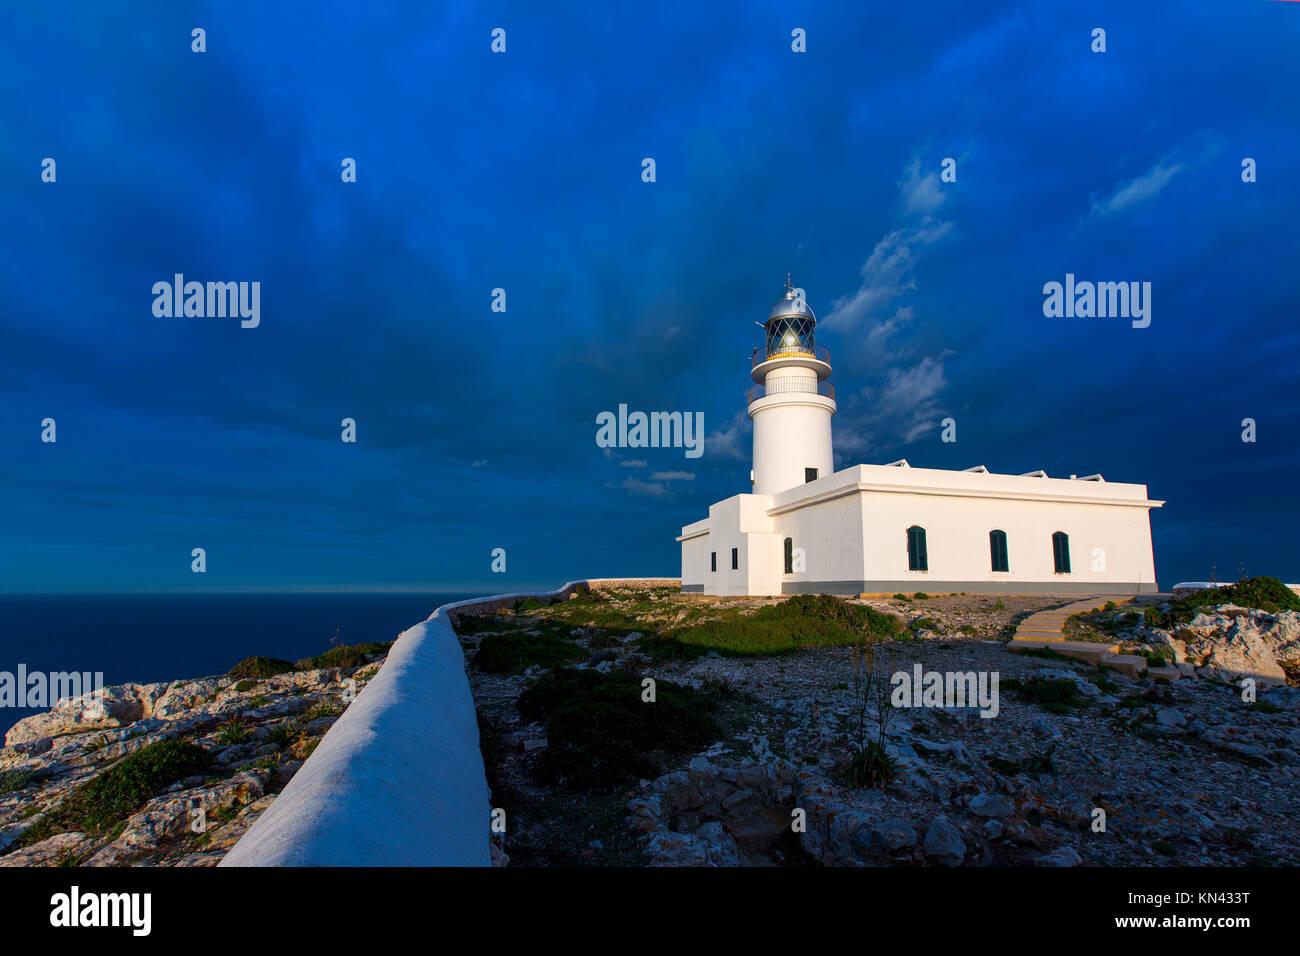 Menorca sunset in Faro Far de Caballeria Lighthouse at Balearic Islands es Mercadal. - Stock Image